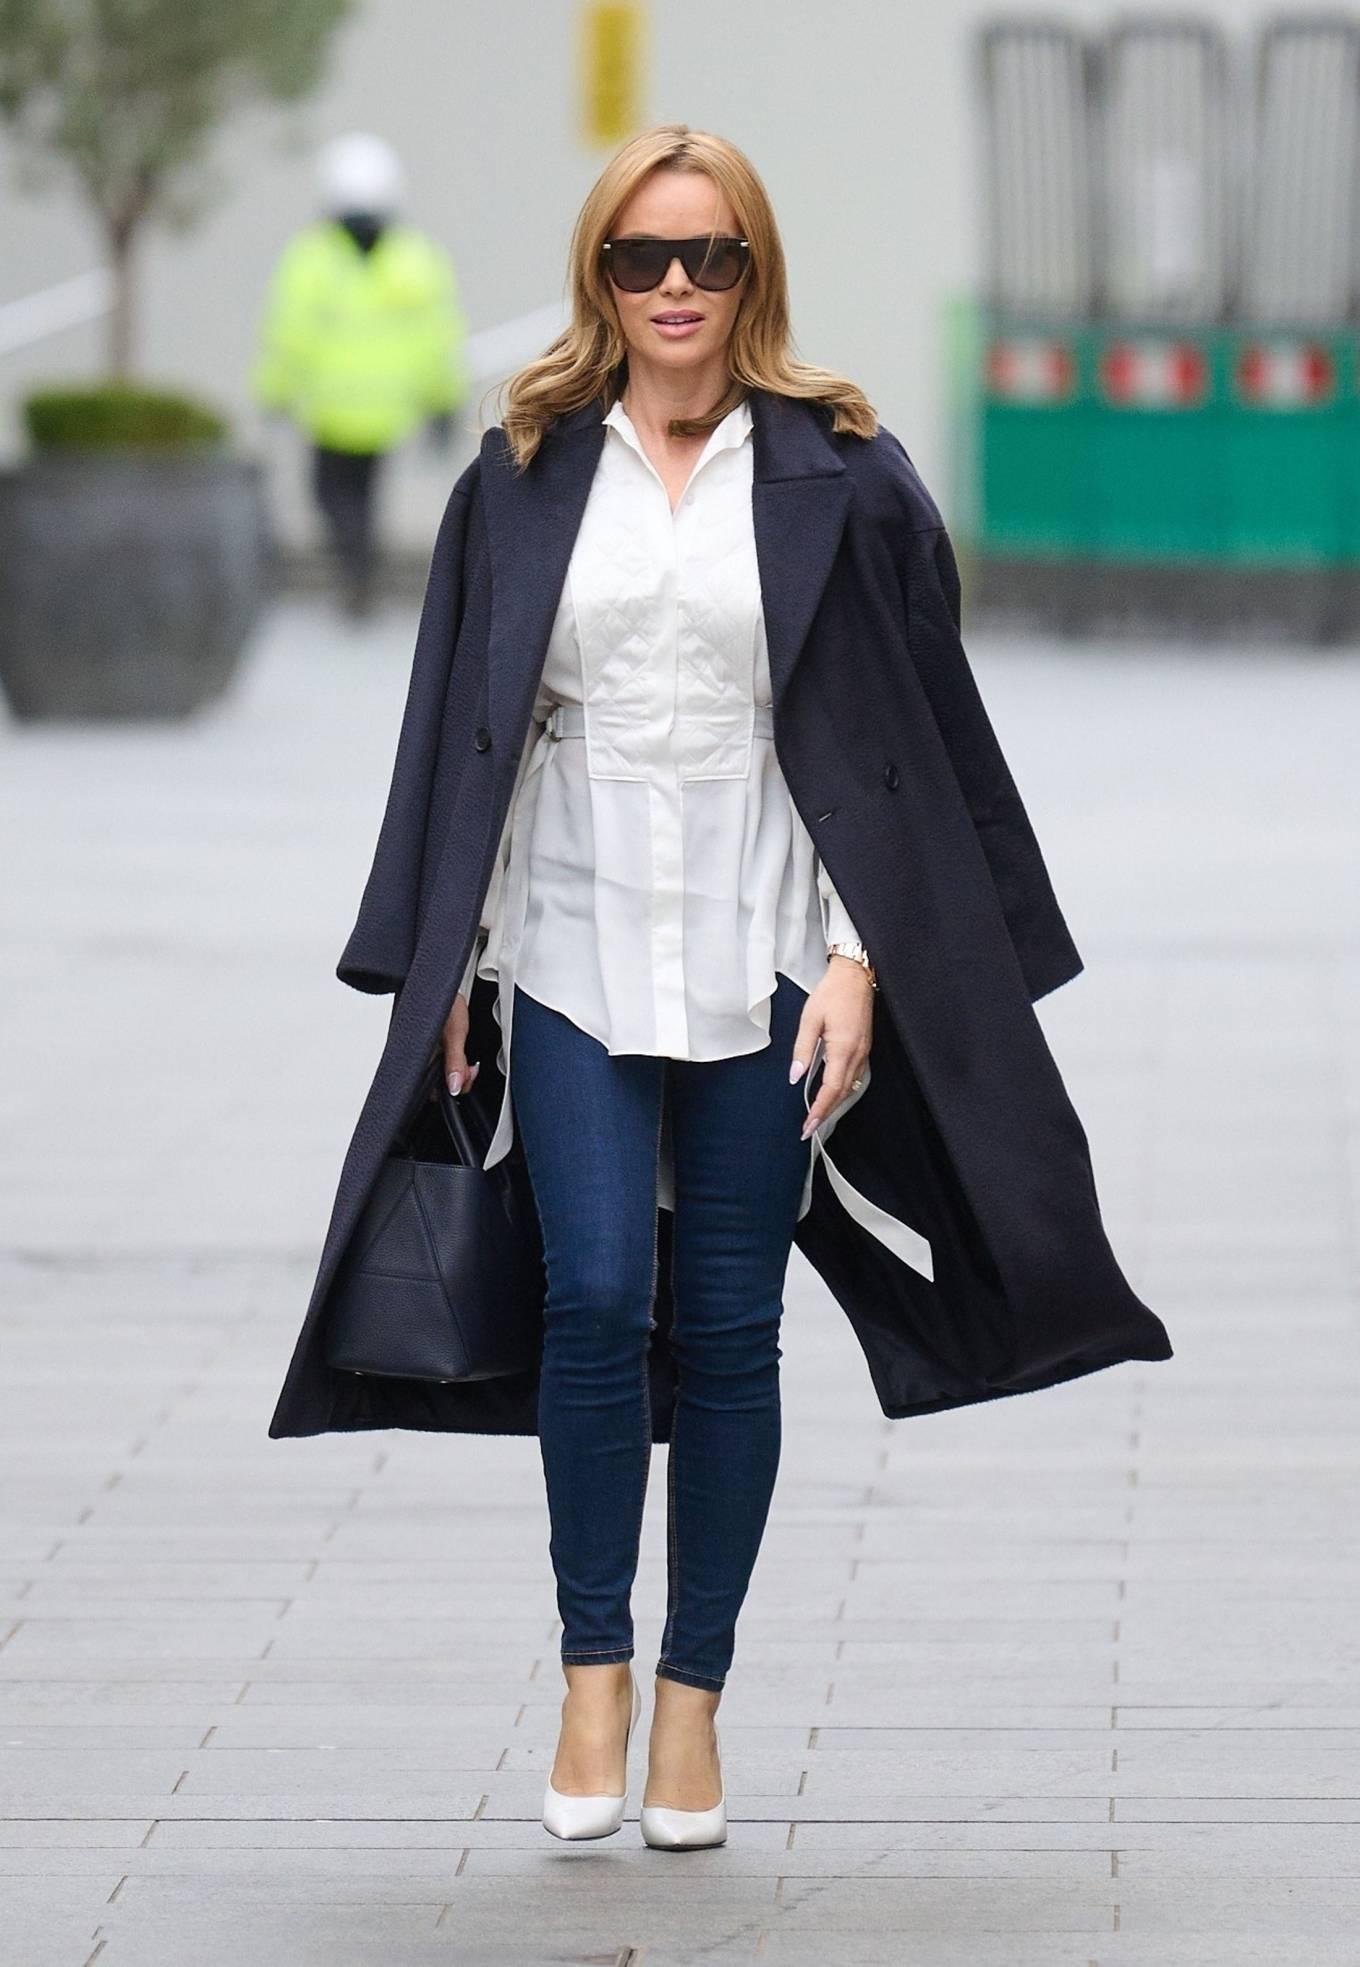 Amanda Holden - Pictured leaving Global Radio Studios in London